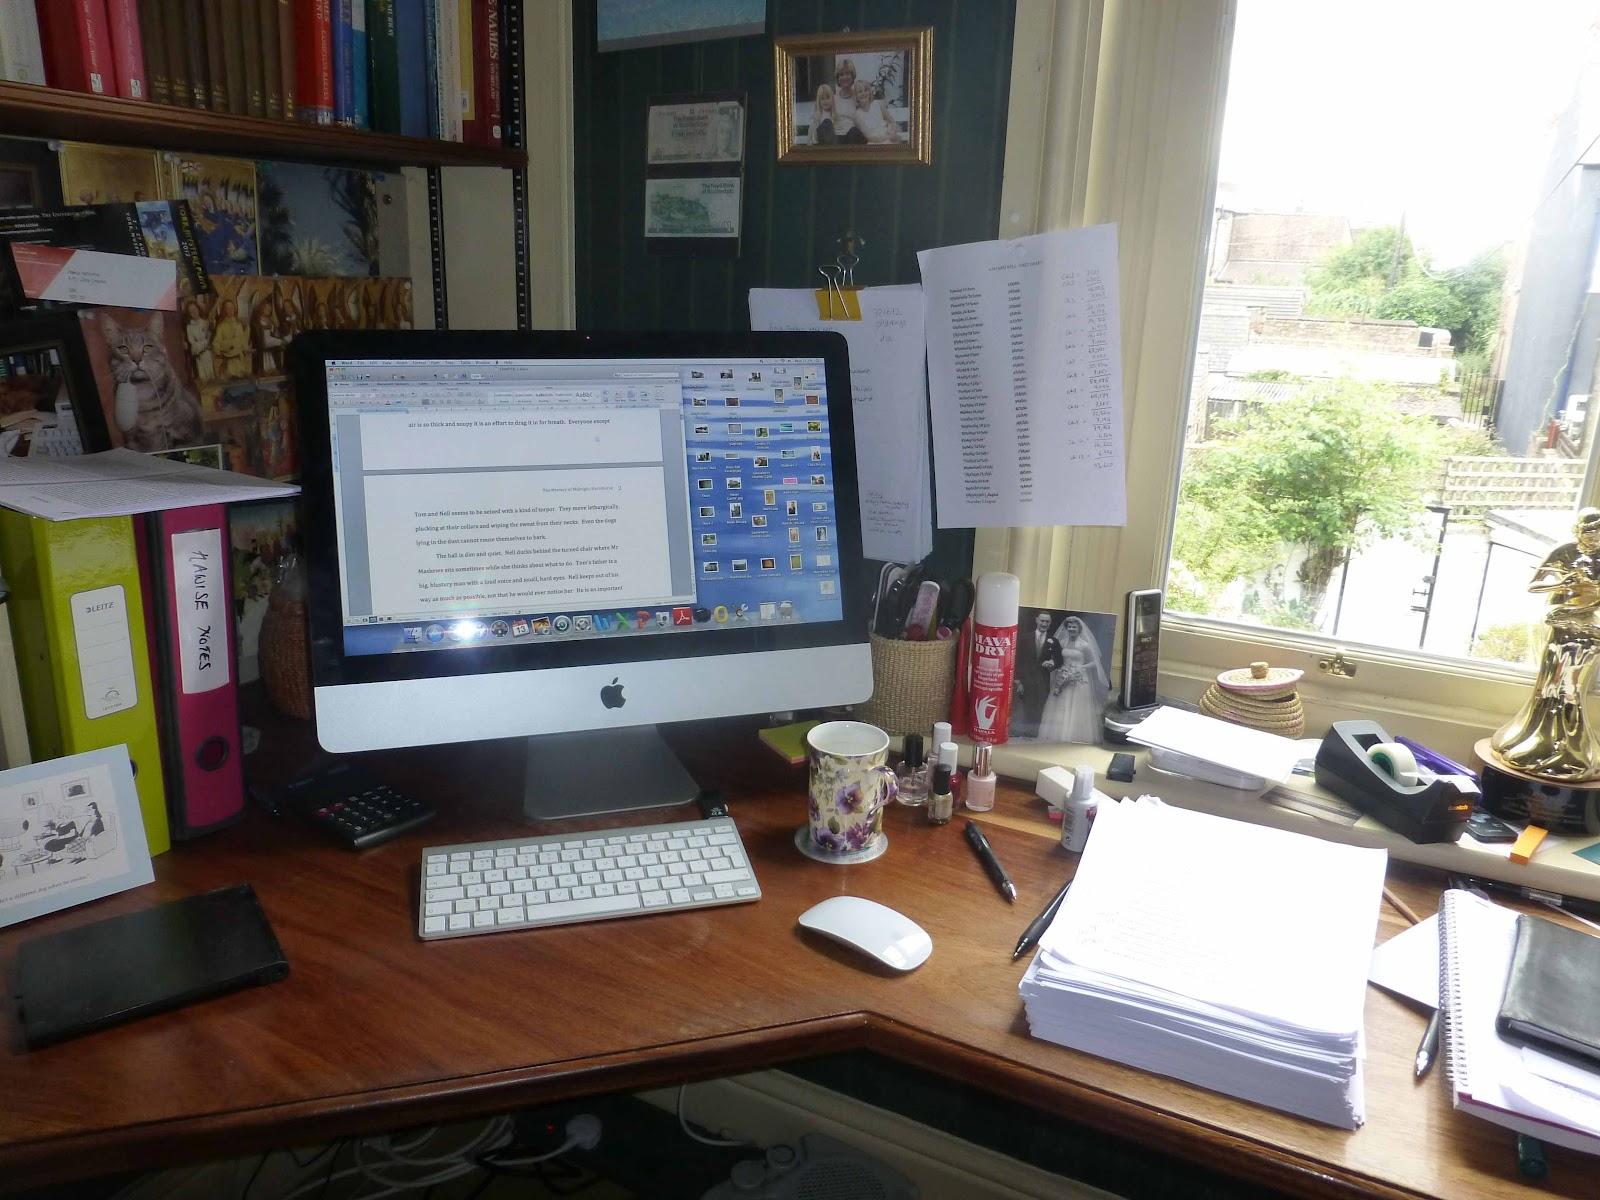 Michael moore sicko analysis essay